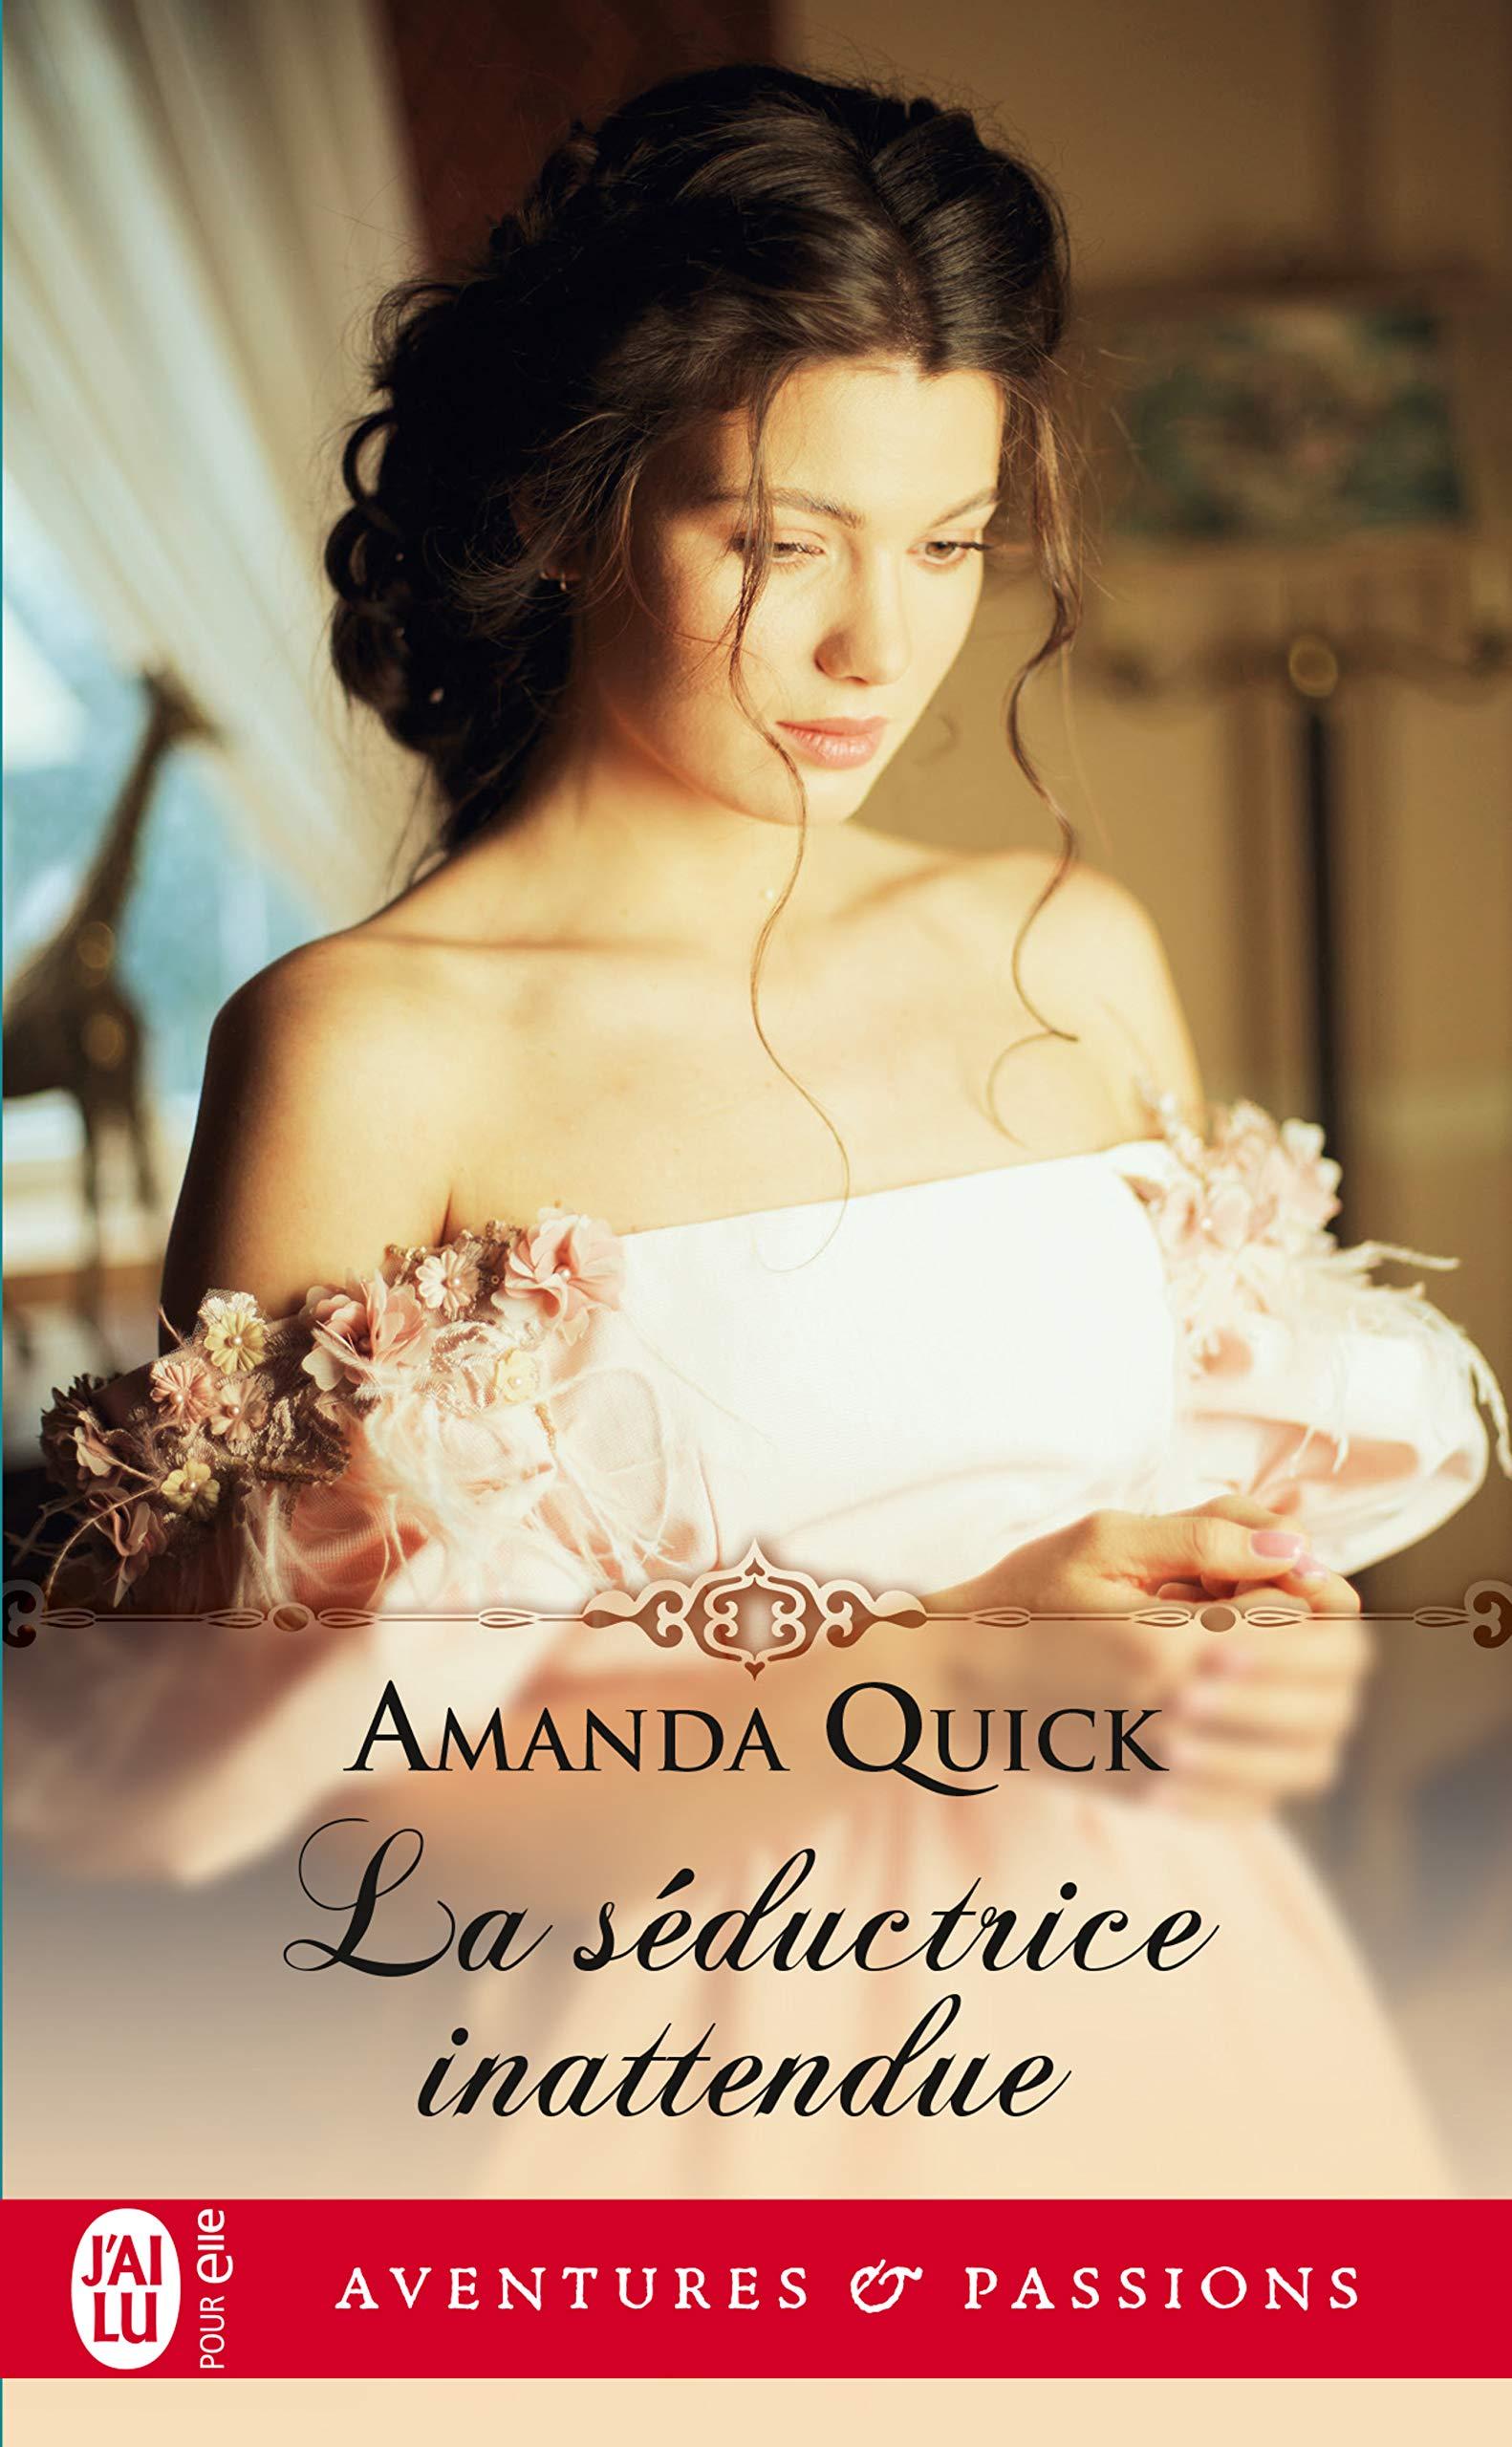 La séductrice inattendue de Amanda Quick 81KaT79yrRL